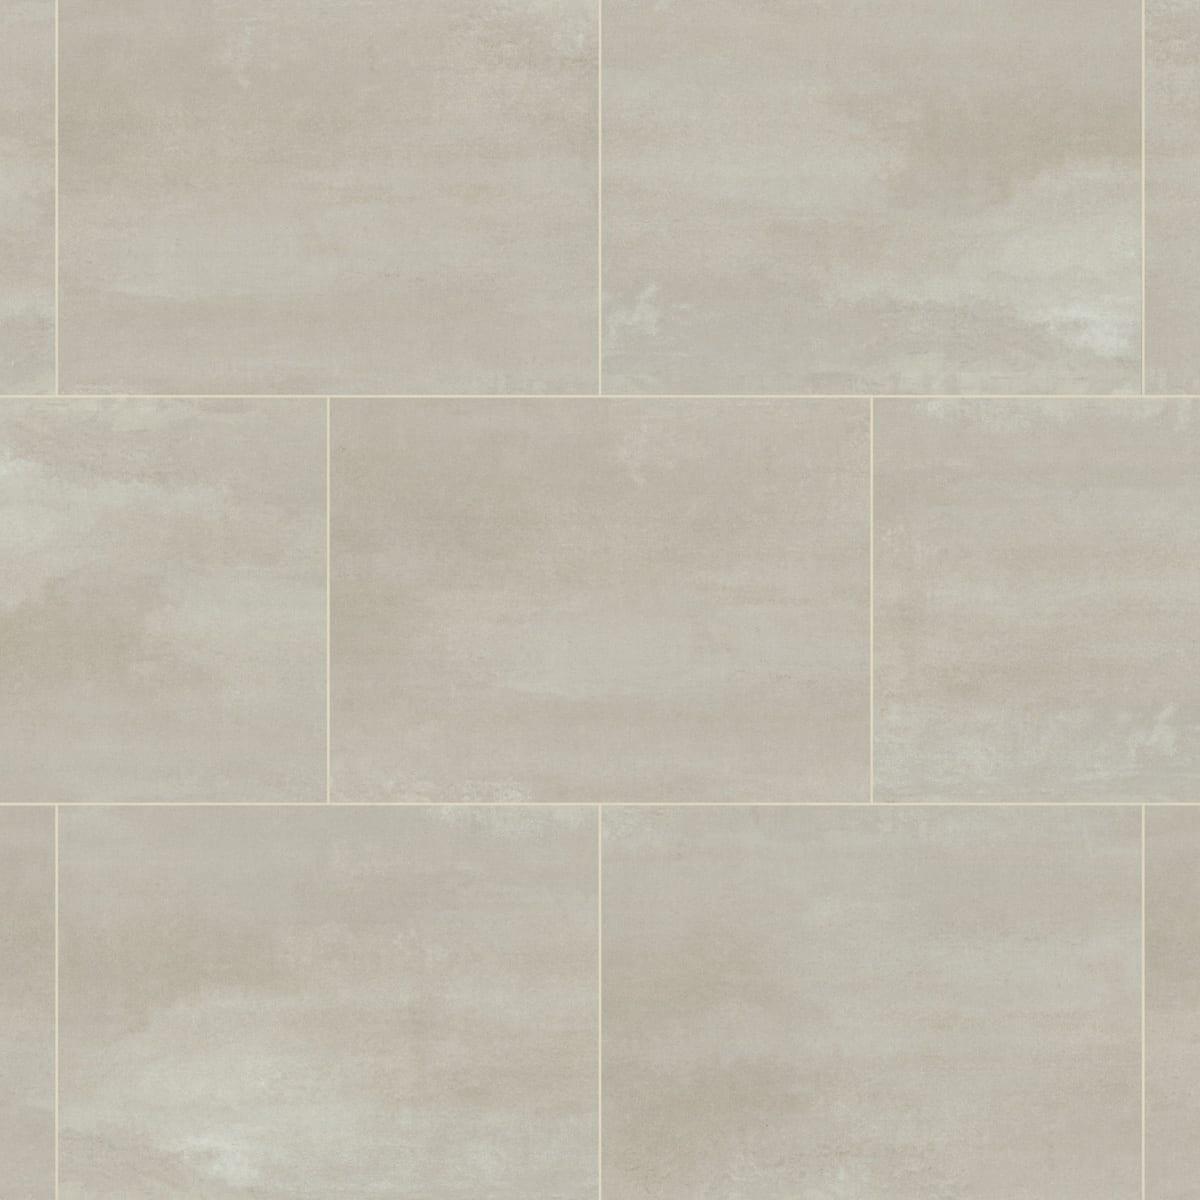 Karndean opus stone tiles mckenzie willis for Opus wallpaper range